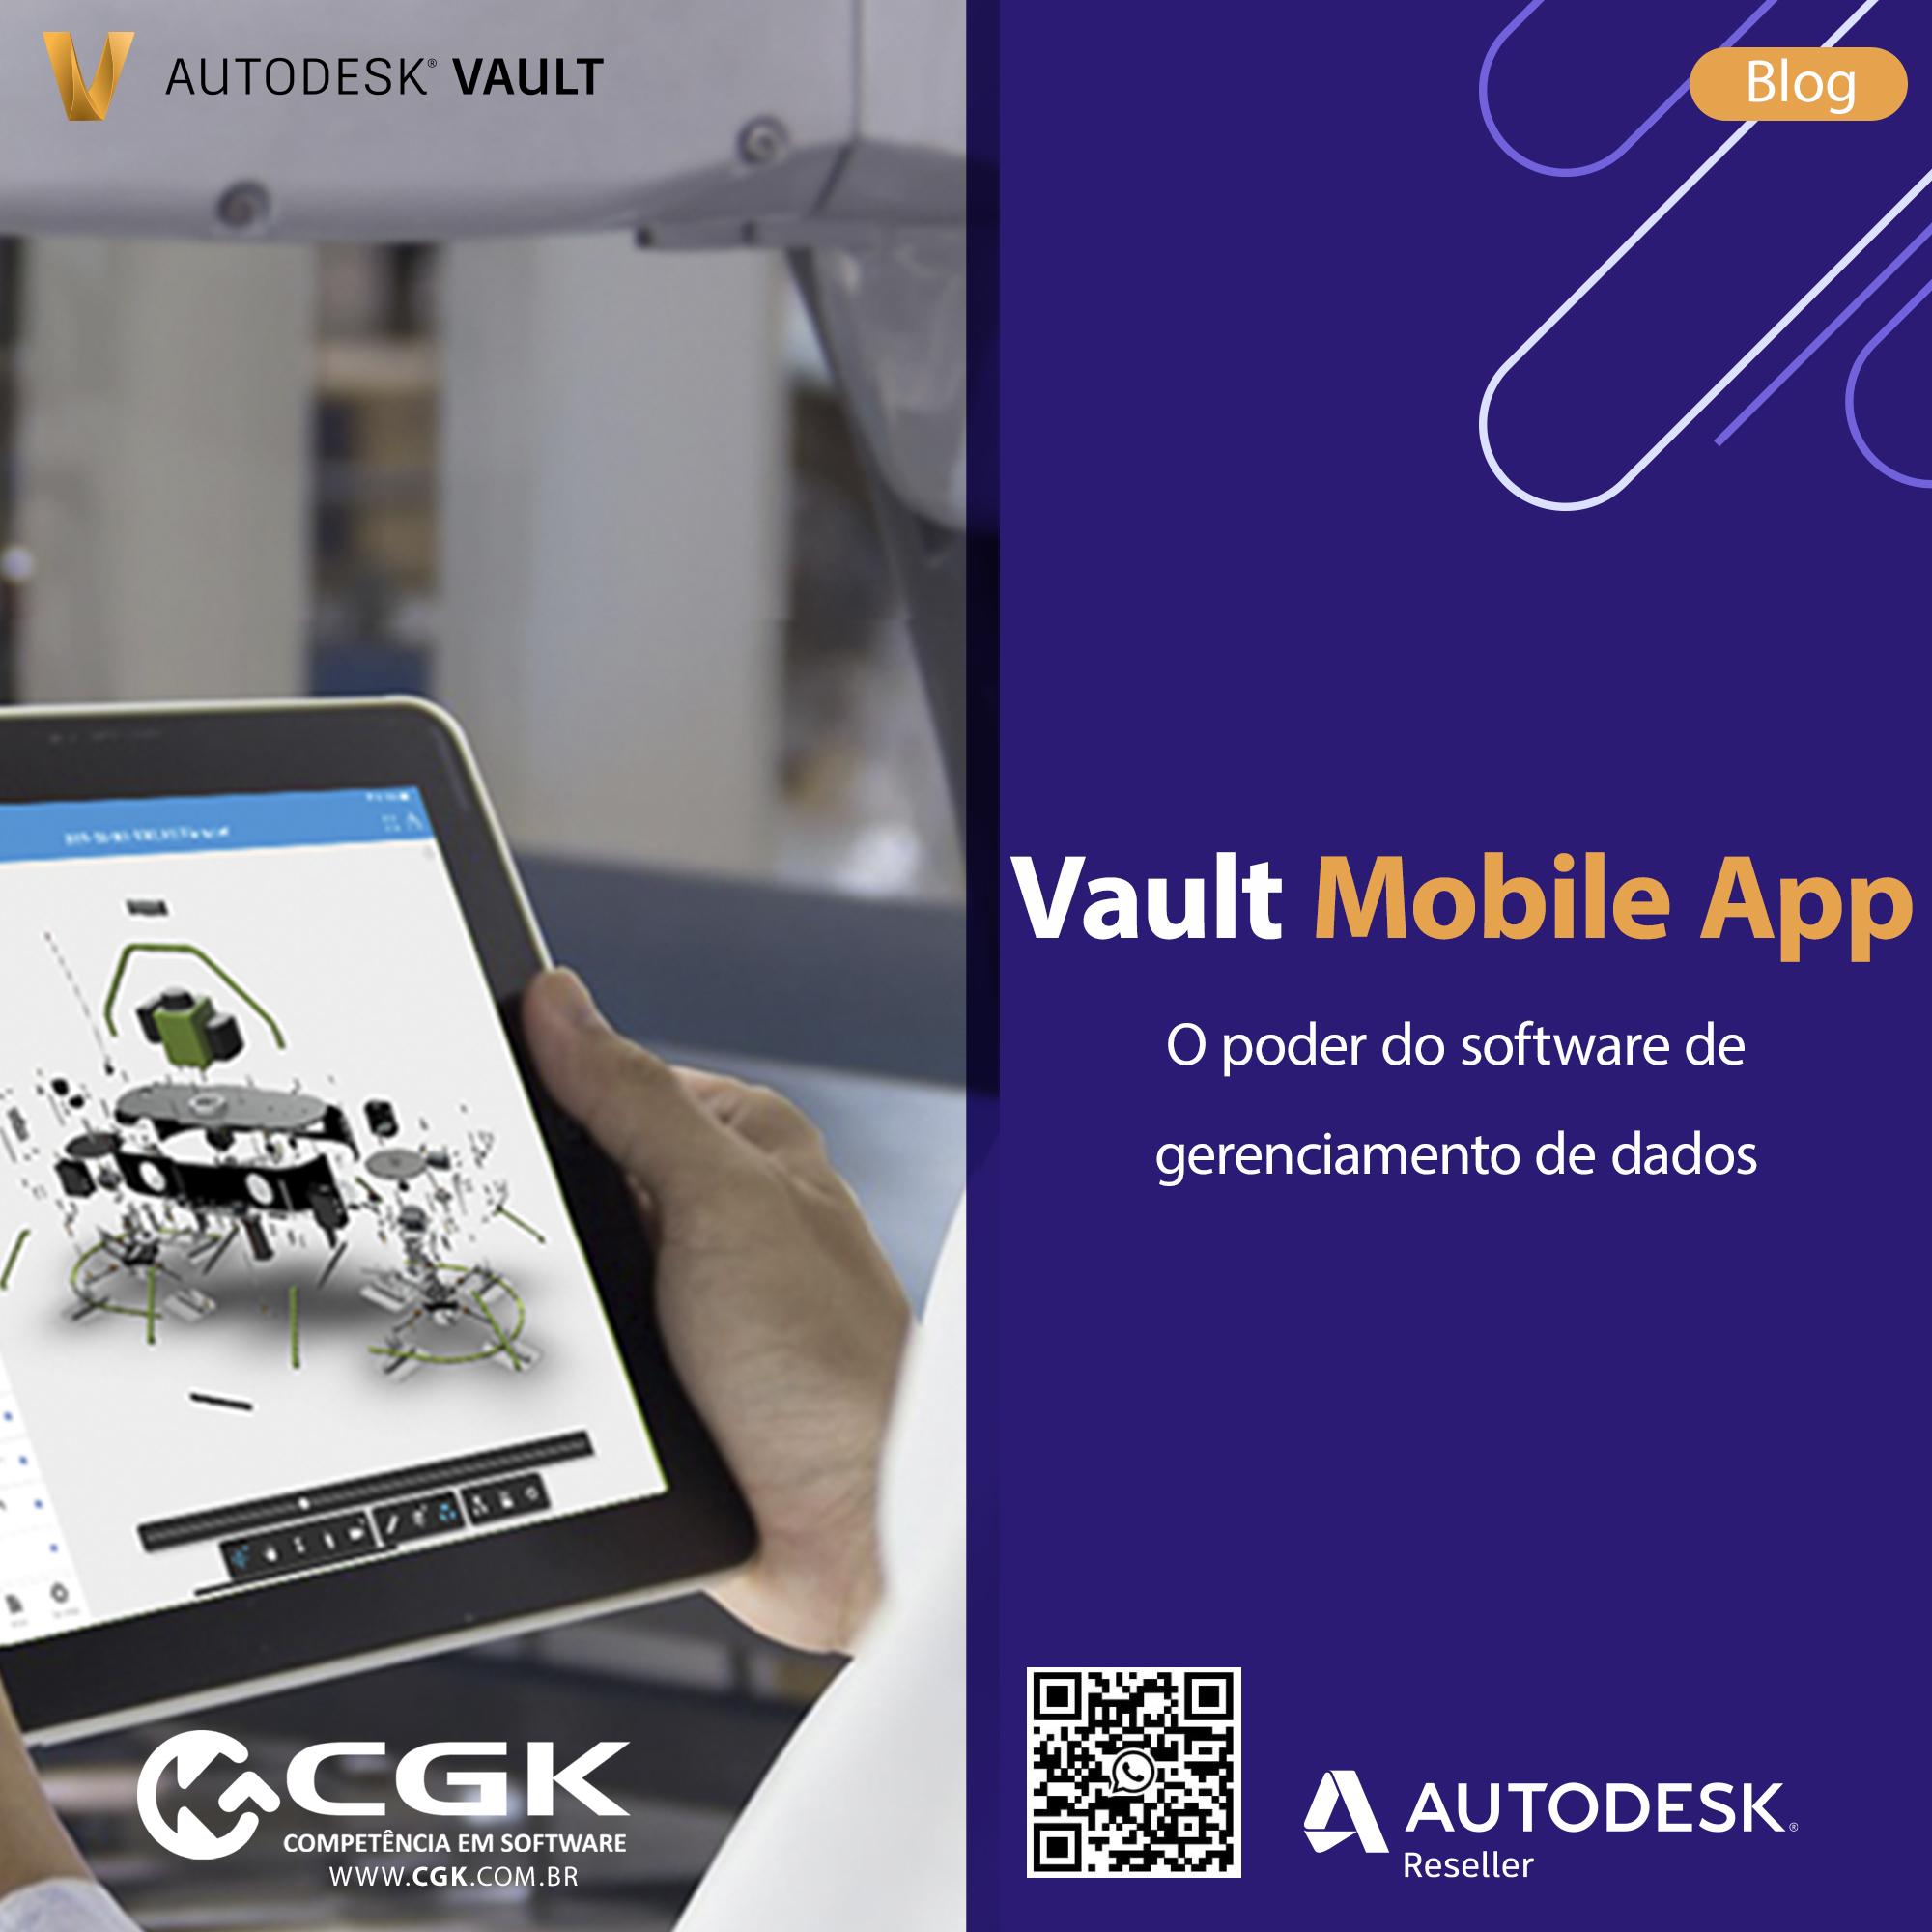 Vault Mobile App